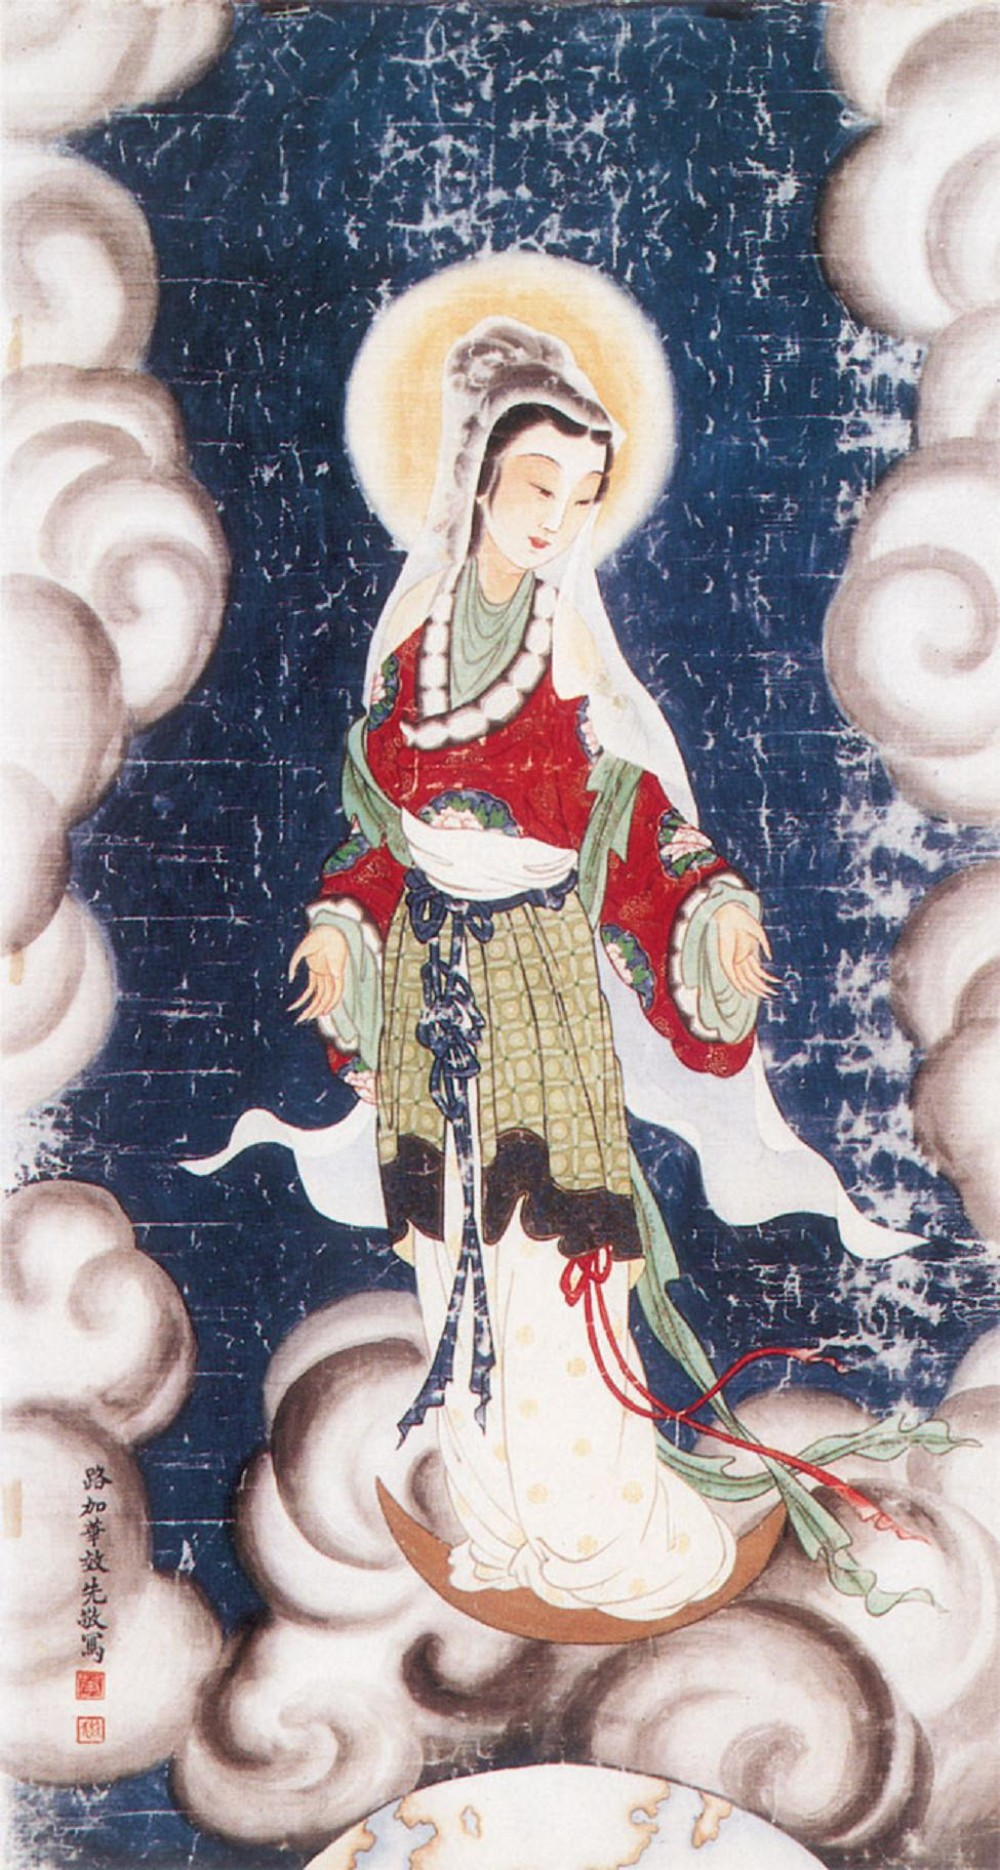 chinese-christian-painting-08-e1279086530682.jpg